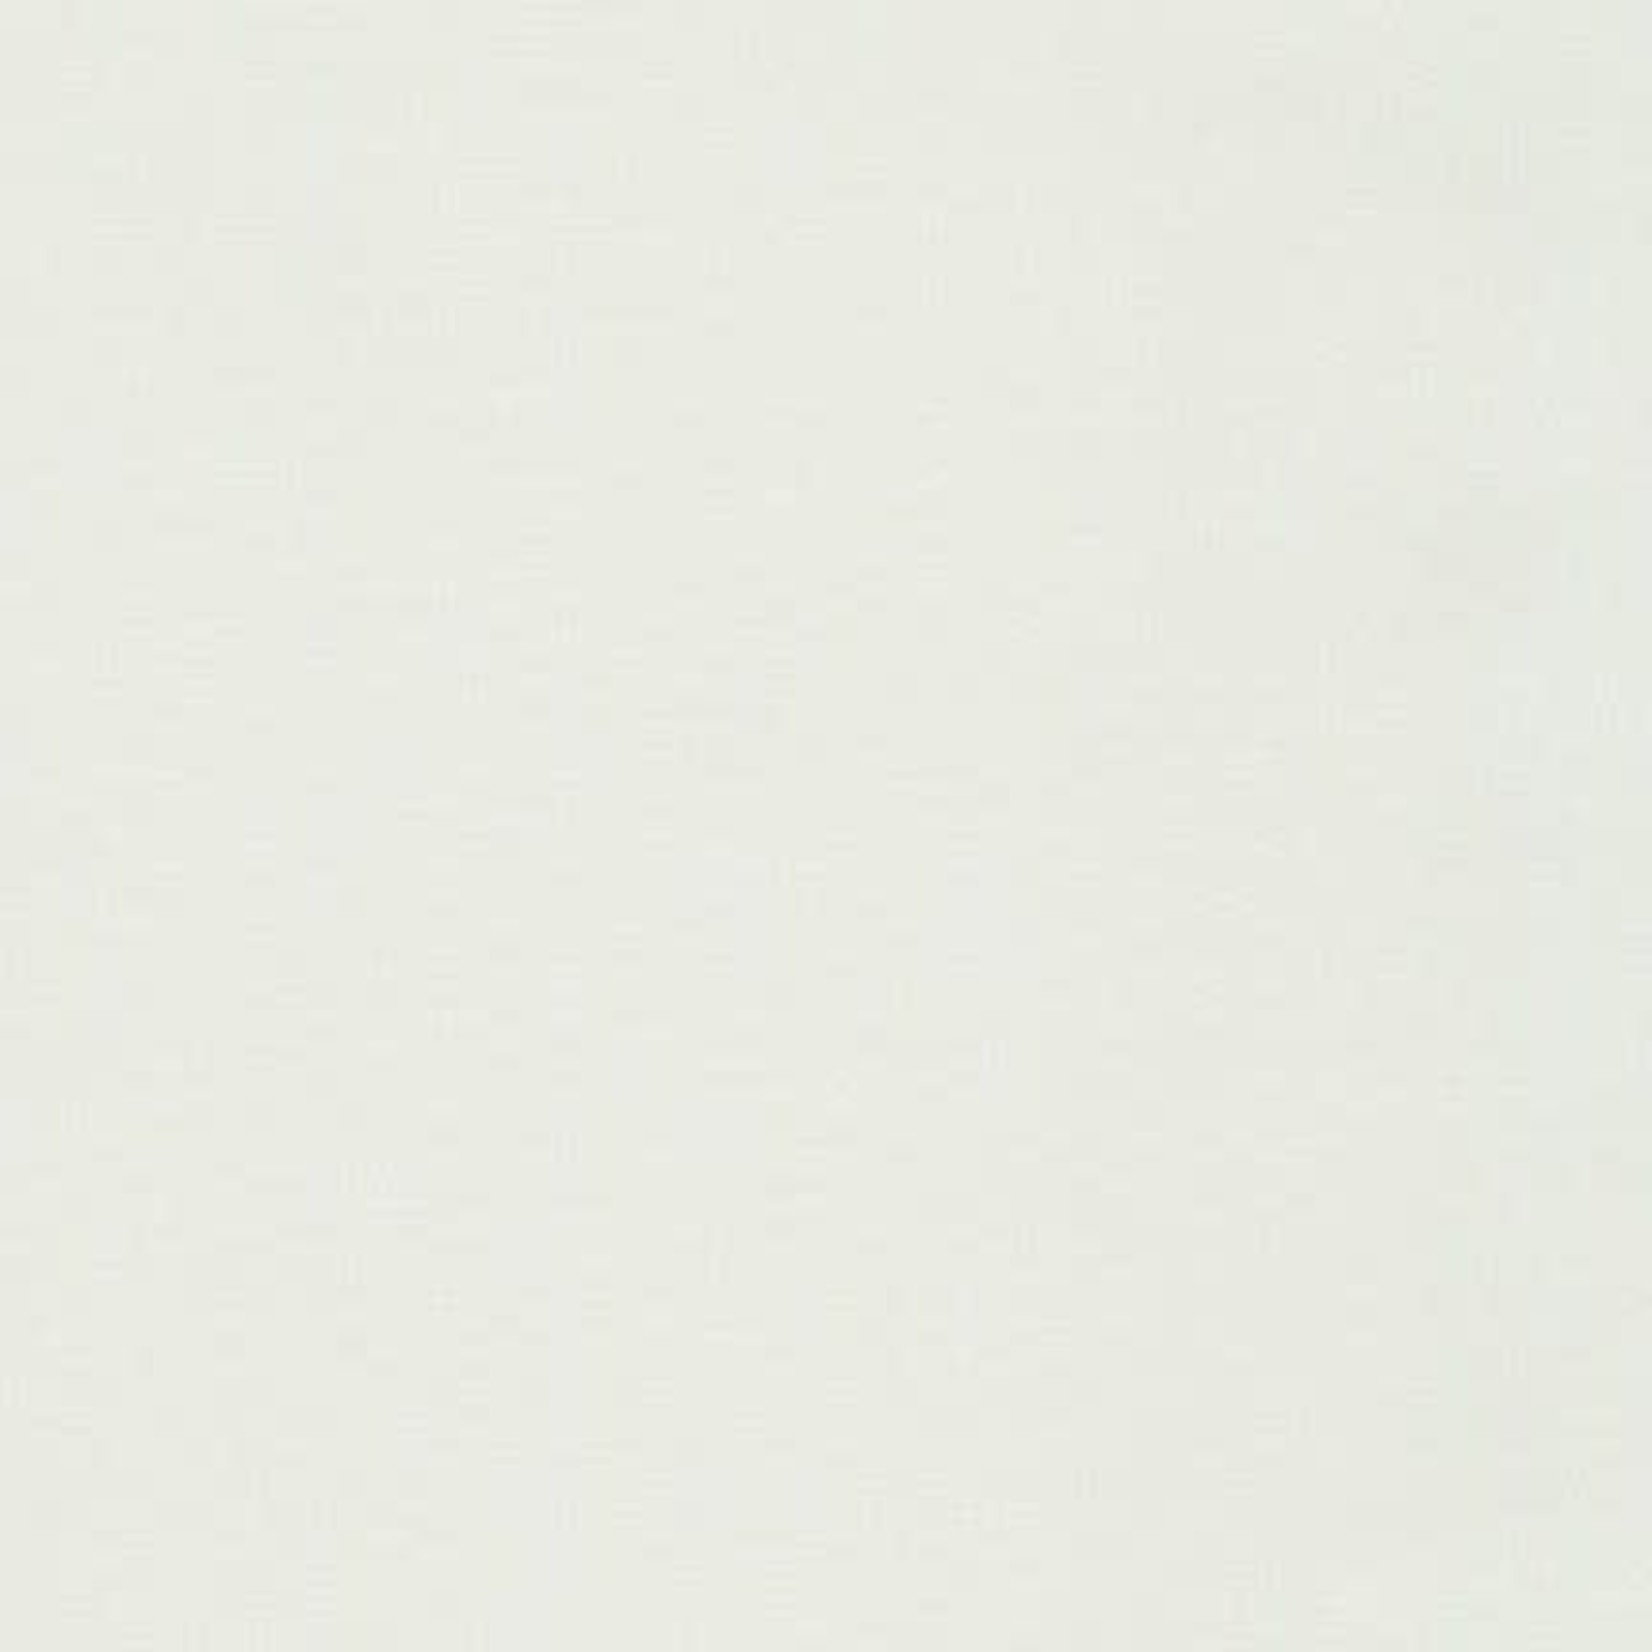 Kona KONA  K001-863 HAZE, PER CM OR $14/M